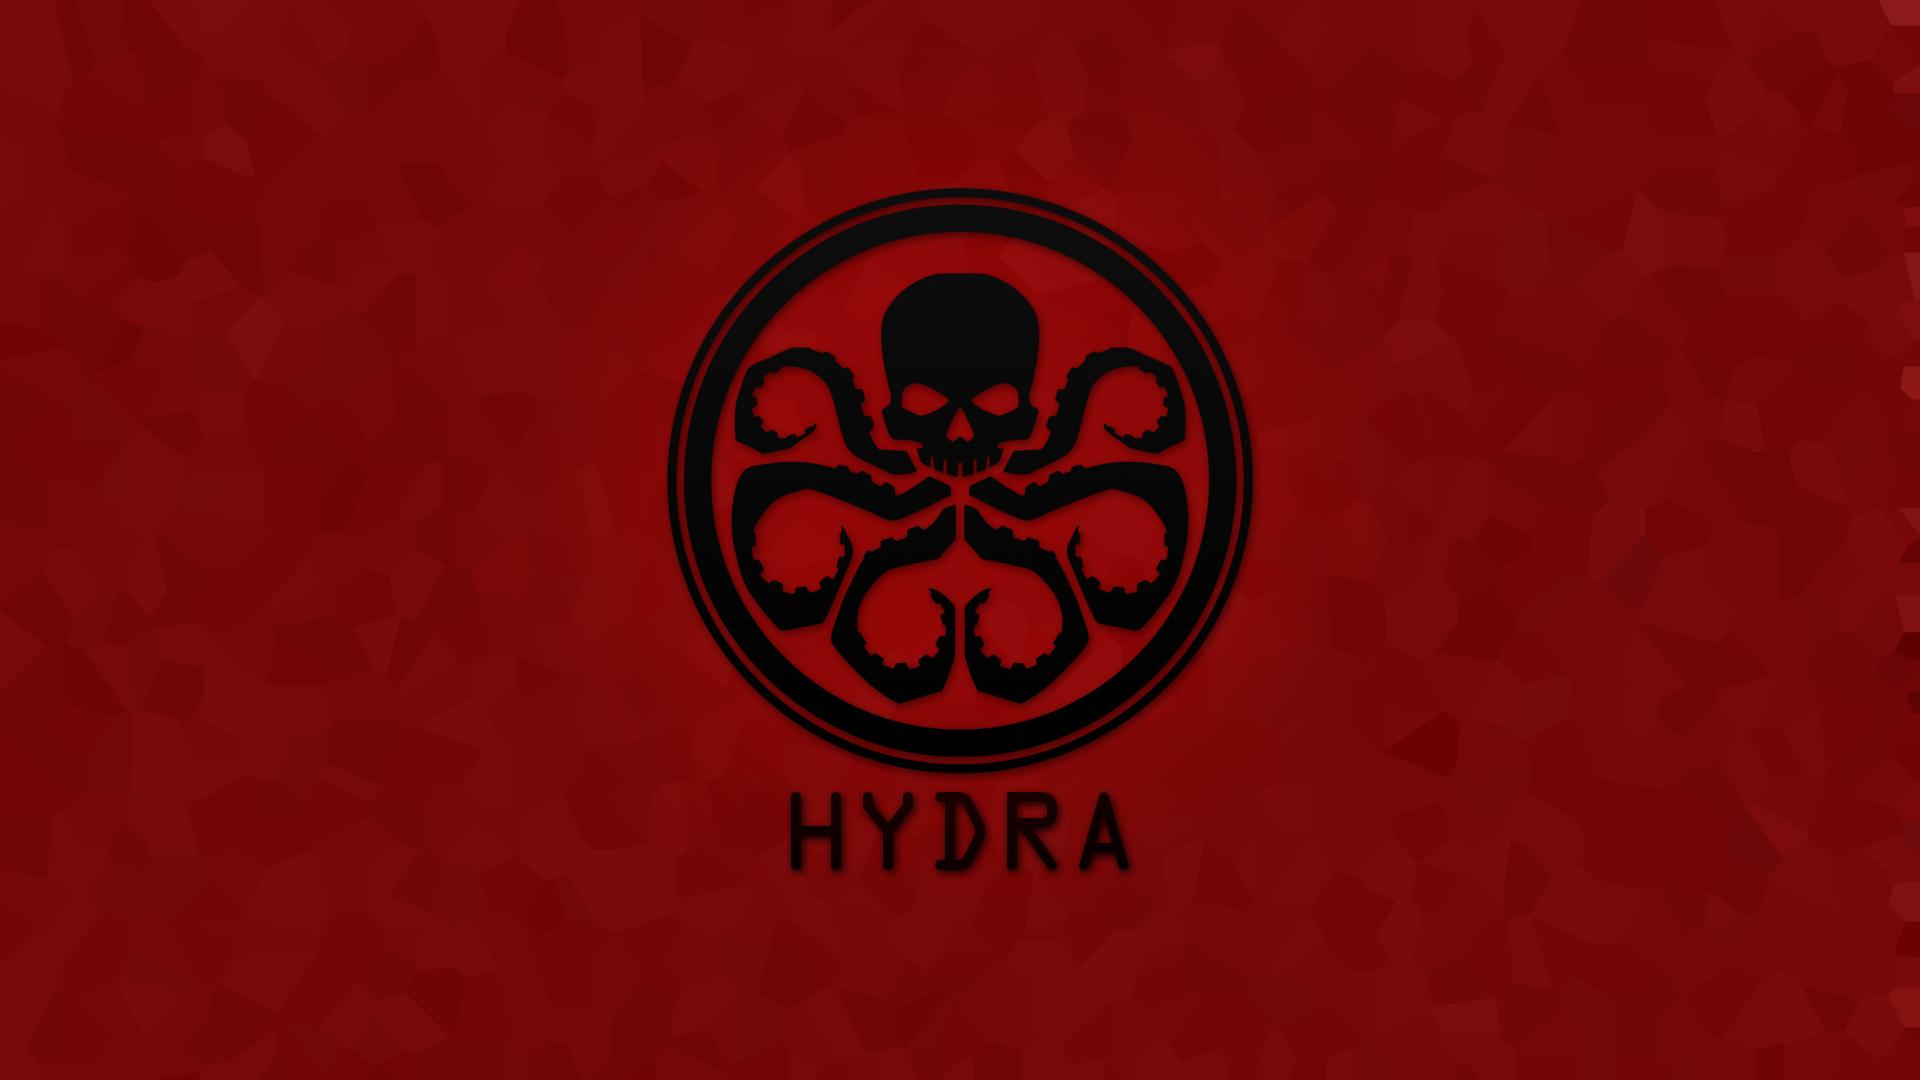 wallpaper hydra by desous on deviantart